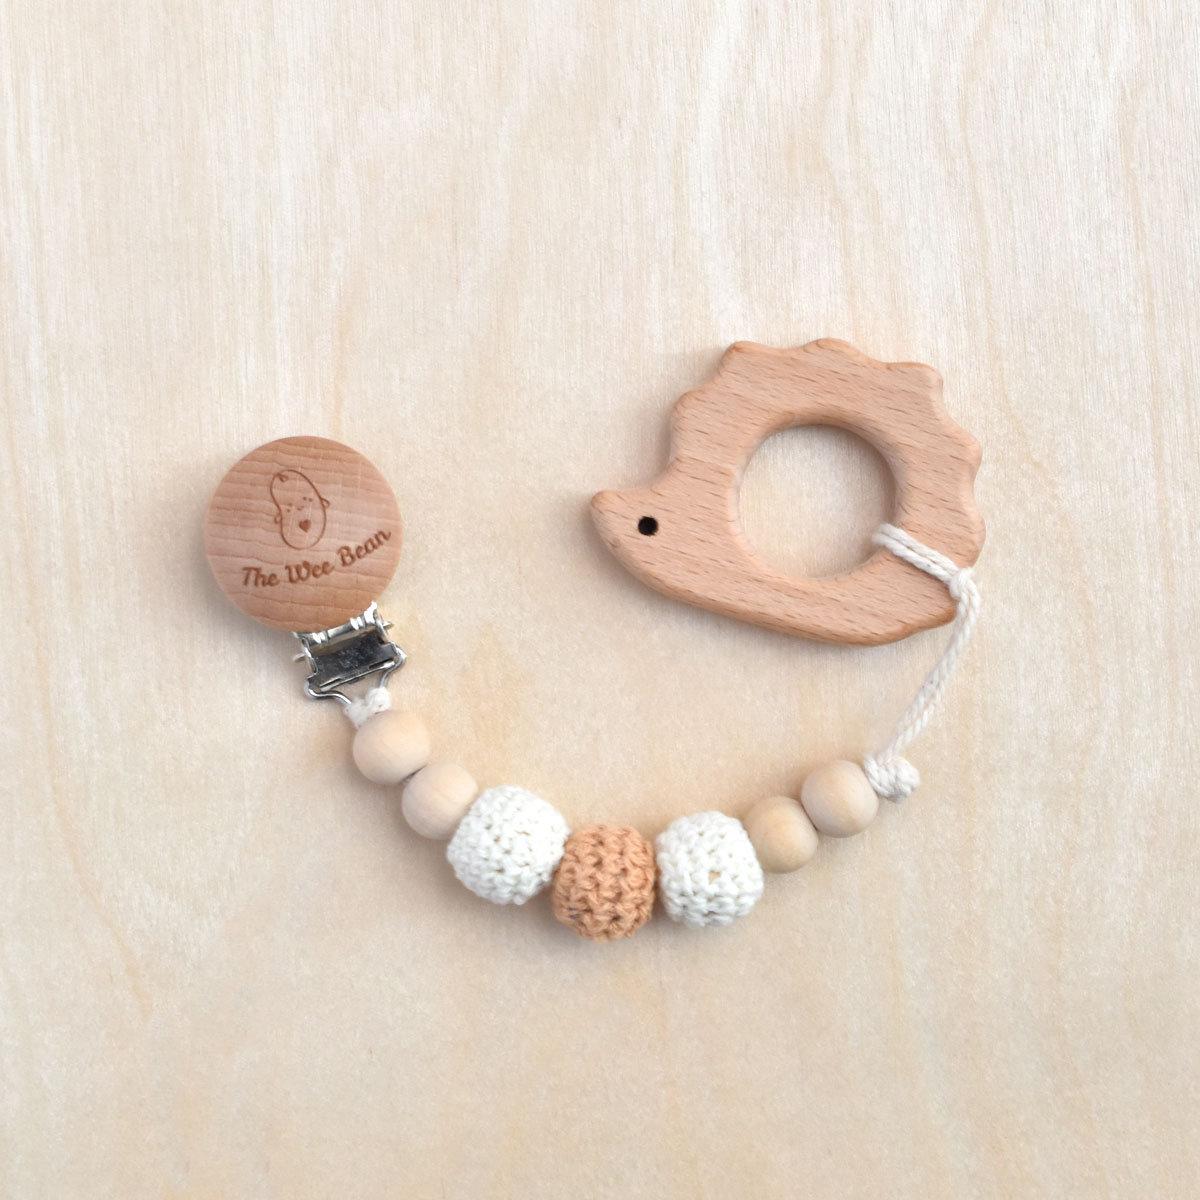 Hedgehog Organic Wood Teether + Pacifier Clip Set (Neutral Brown Color)